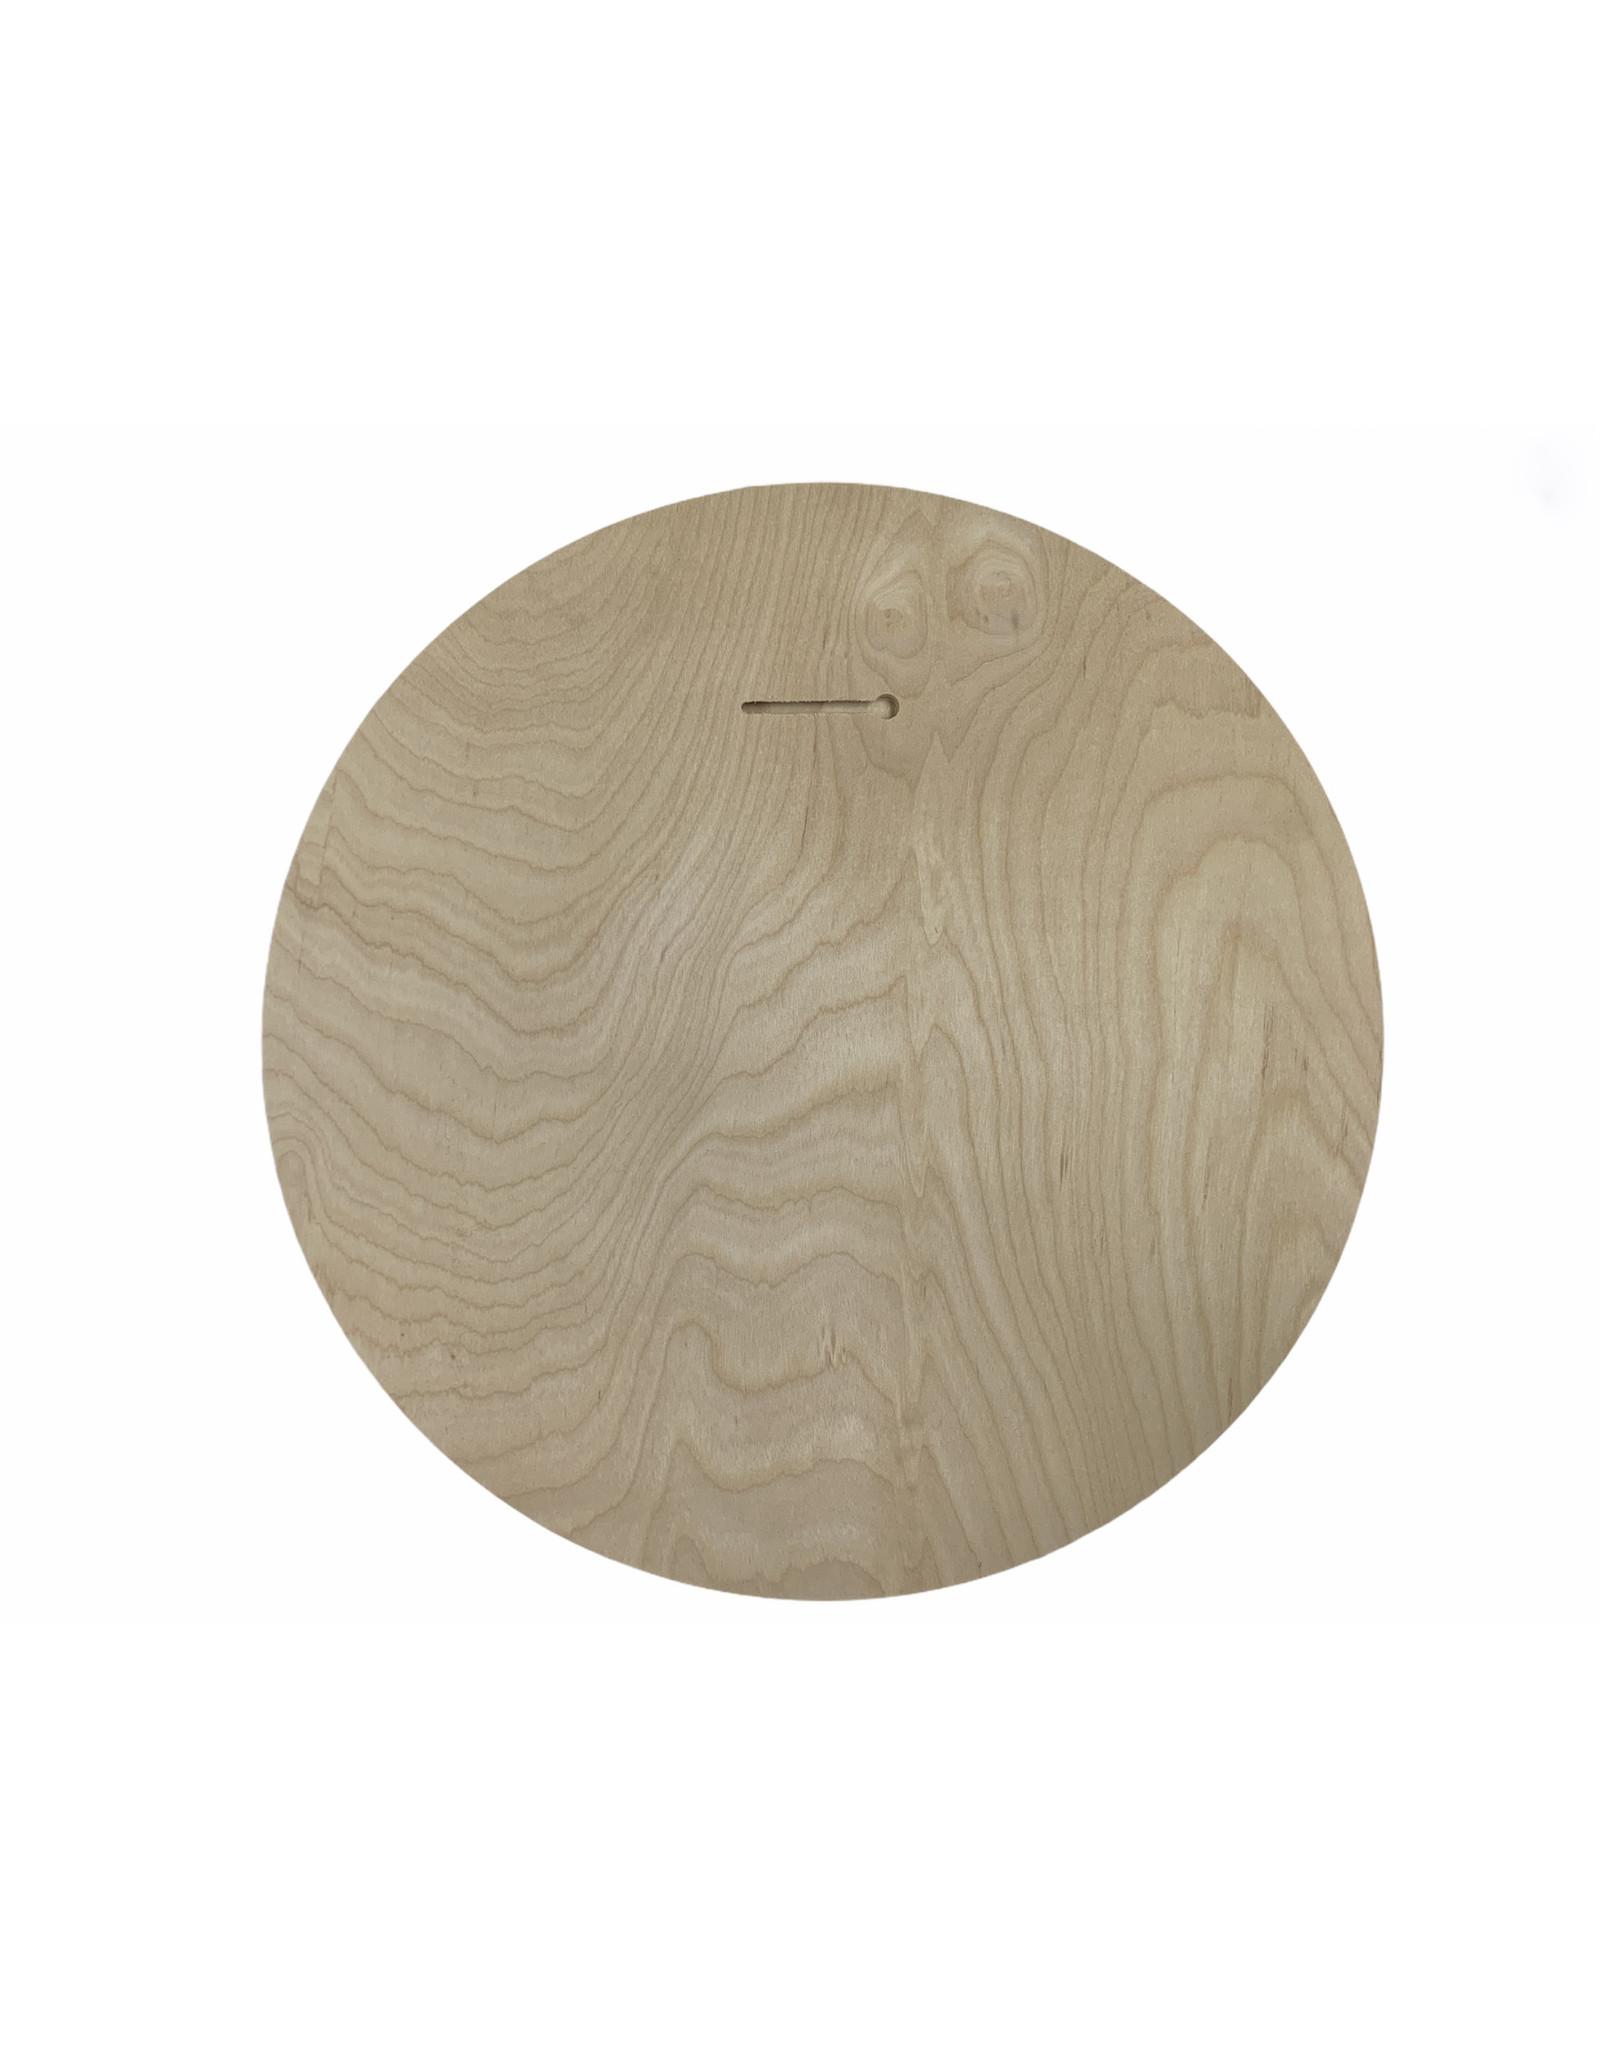 "Lakeshirts INC. HB PALM TREE WOOD CIRCLE SIGN 15.75"""